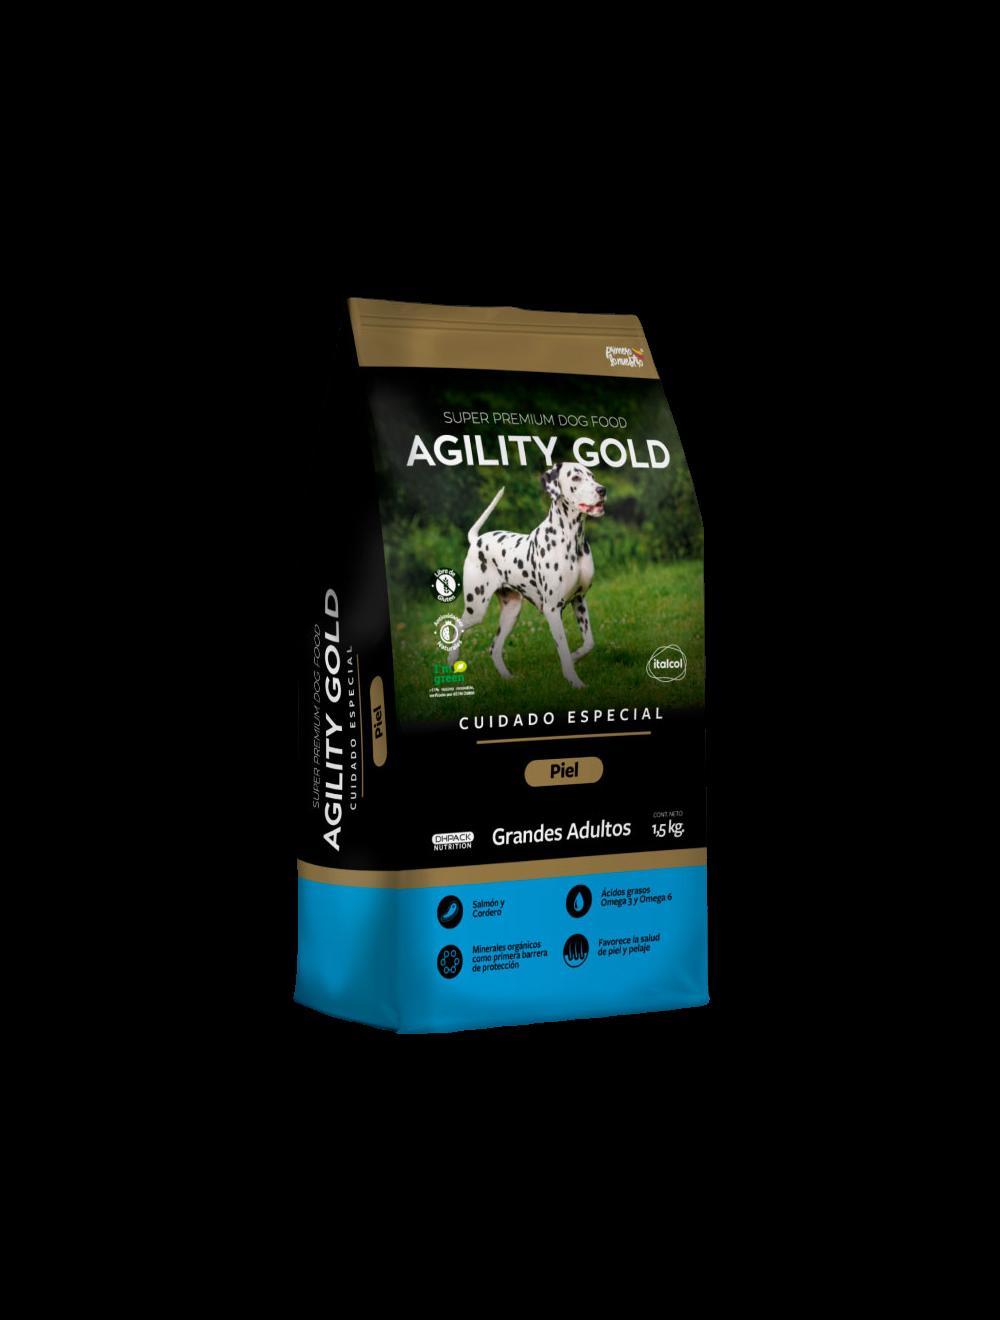 Agility Gold Piel Grandes Adultos 1.5 Kg - Ciudaddemascotas.com